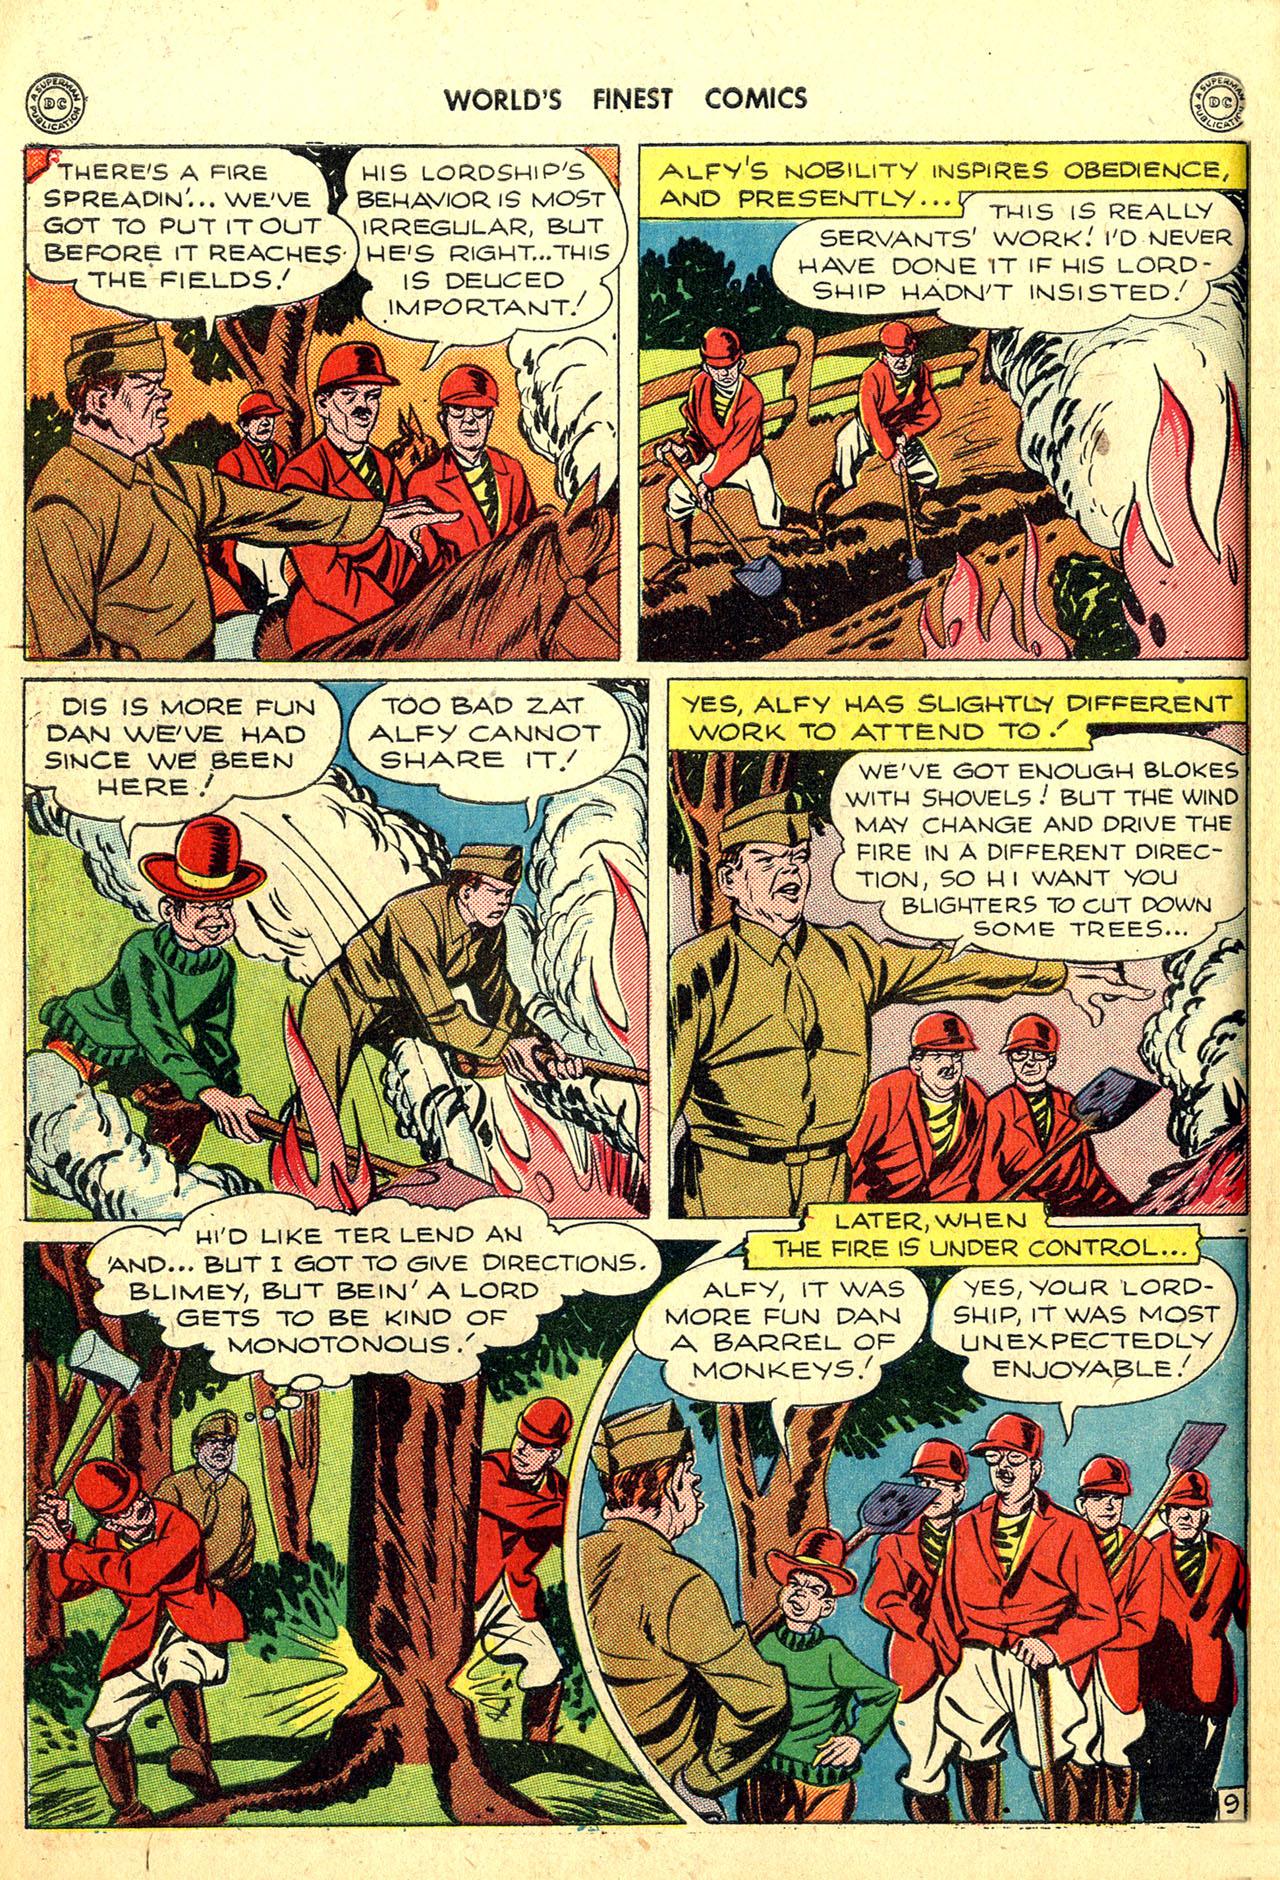 Read online World's Finest Comics comic -  Issue #18 - 44